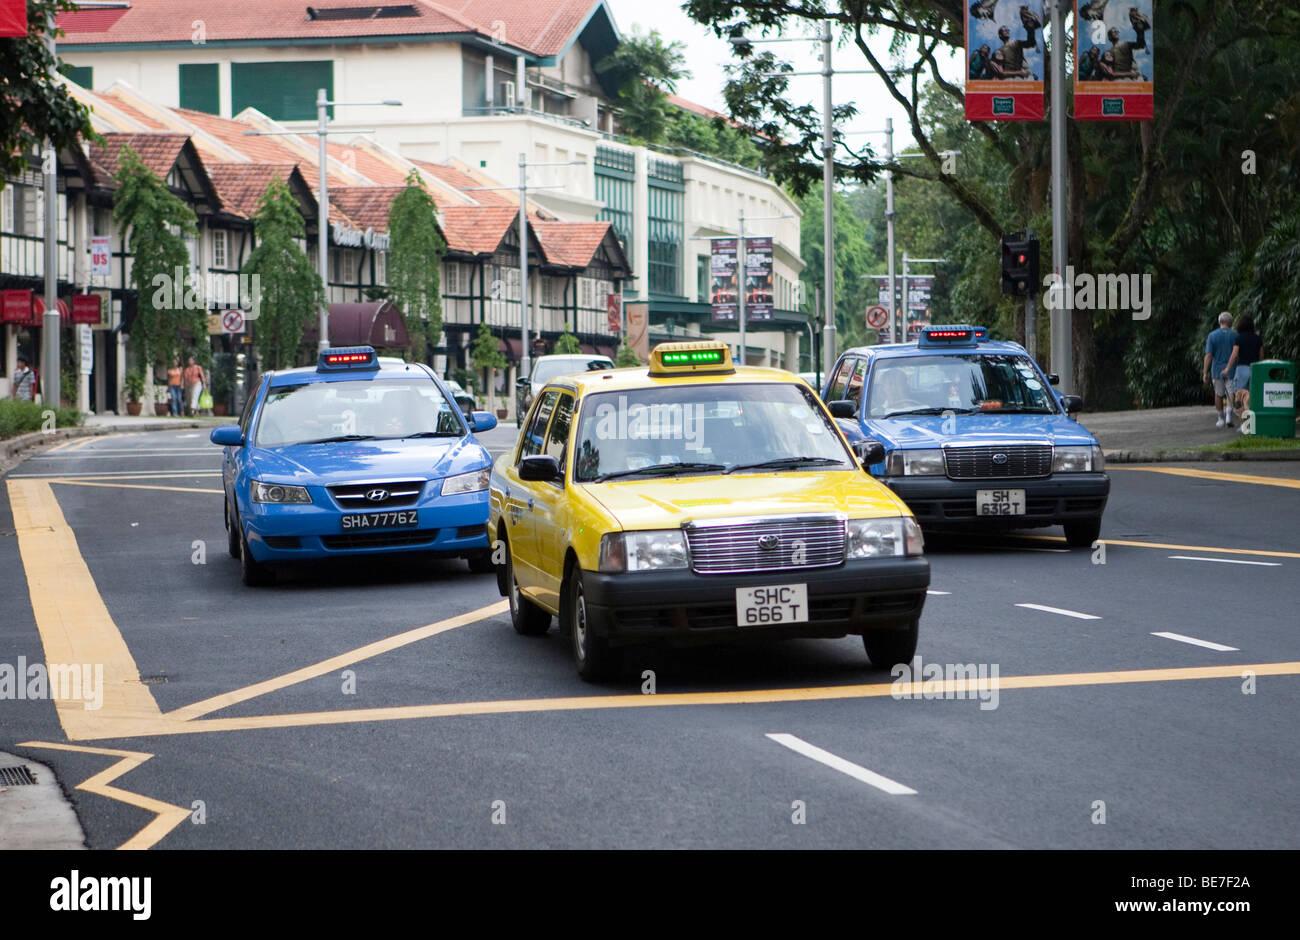 Taxi cab, Singapore, Southeast Asia - Stock Image